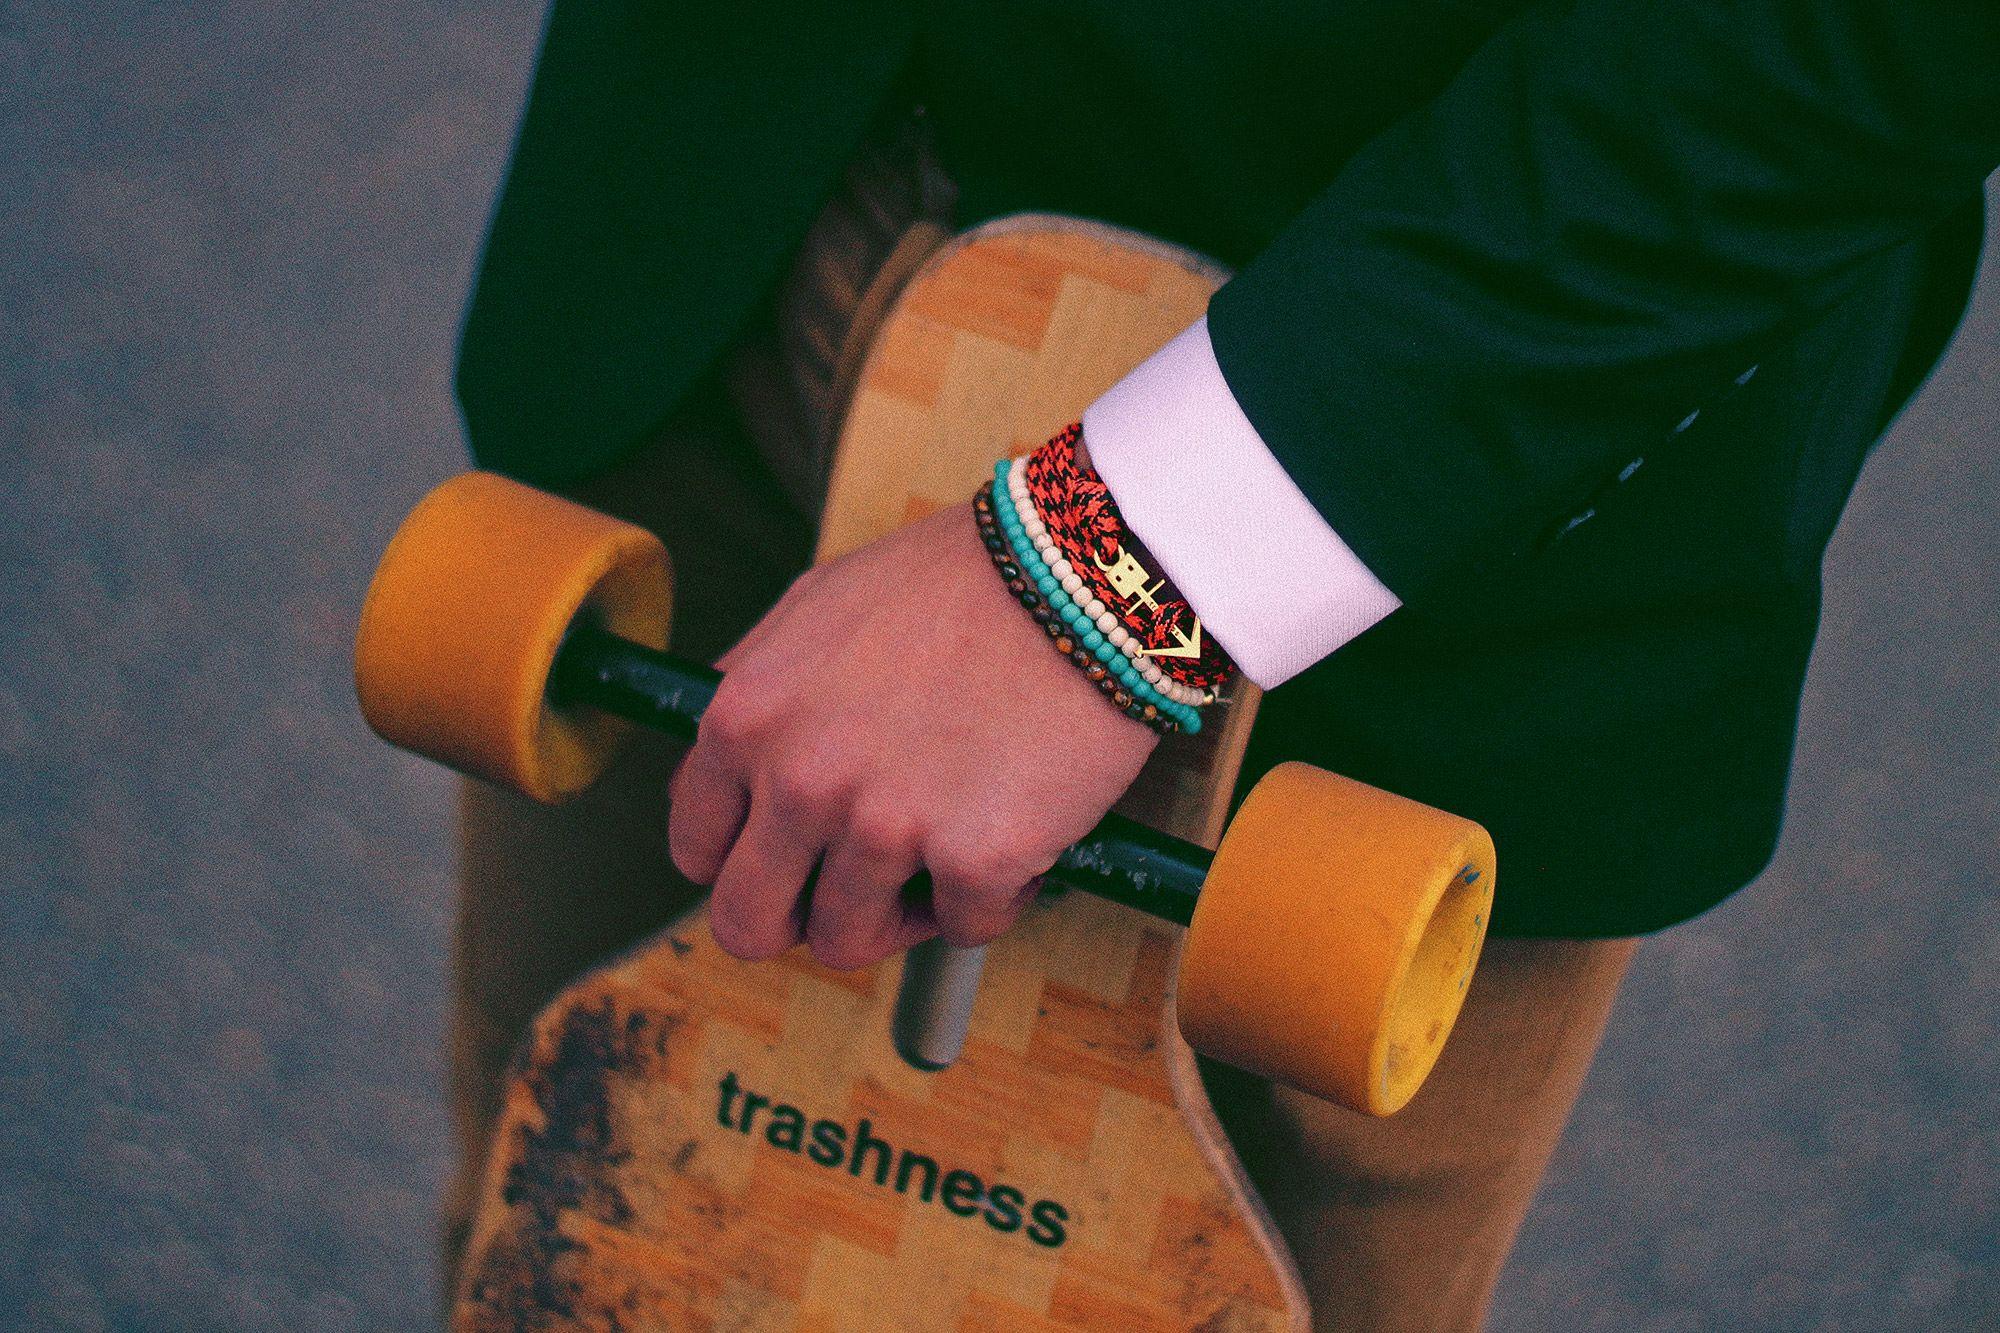 trashness-bracelets.jpg (2000×1333)